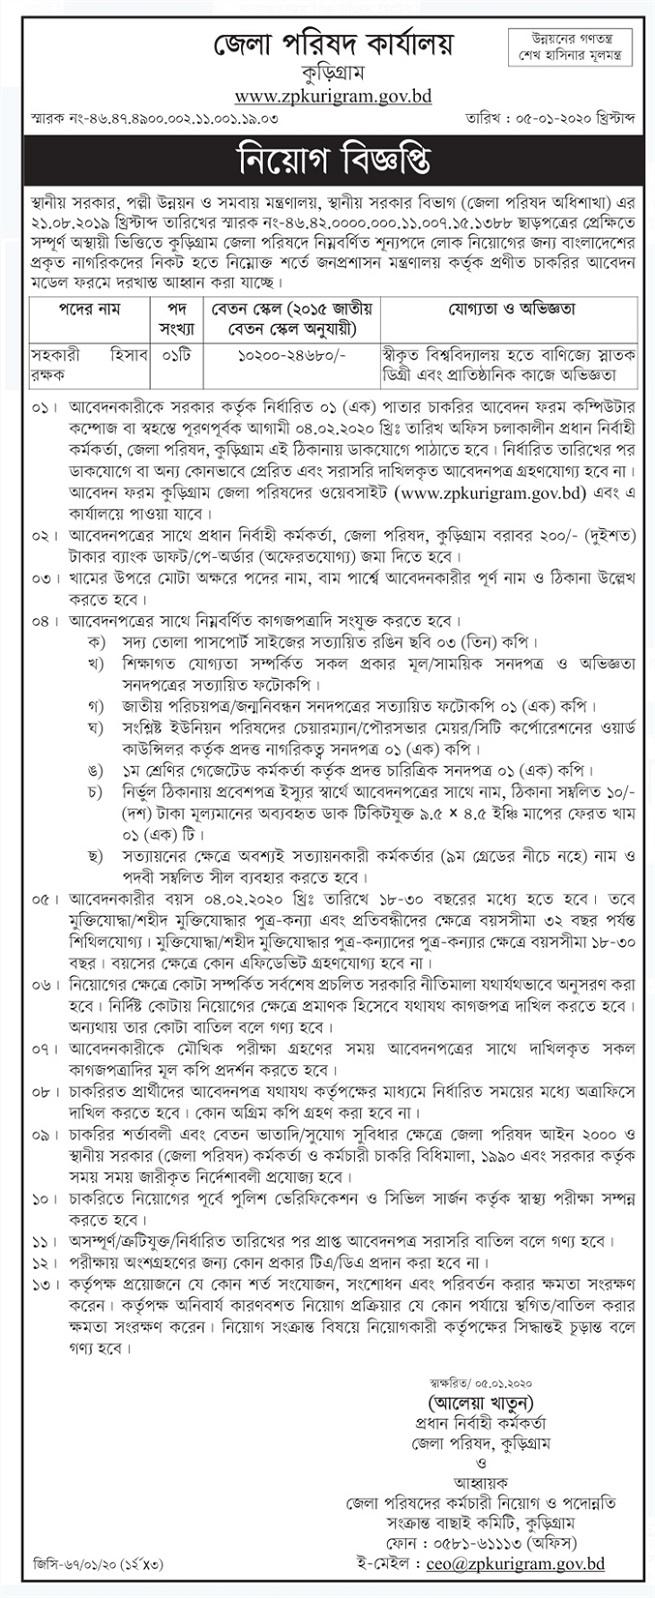 Zilla Parishad Office Job Circular 2020